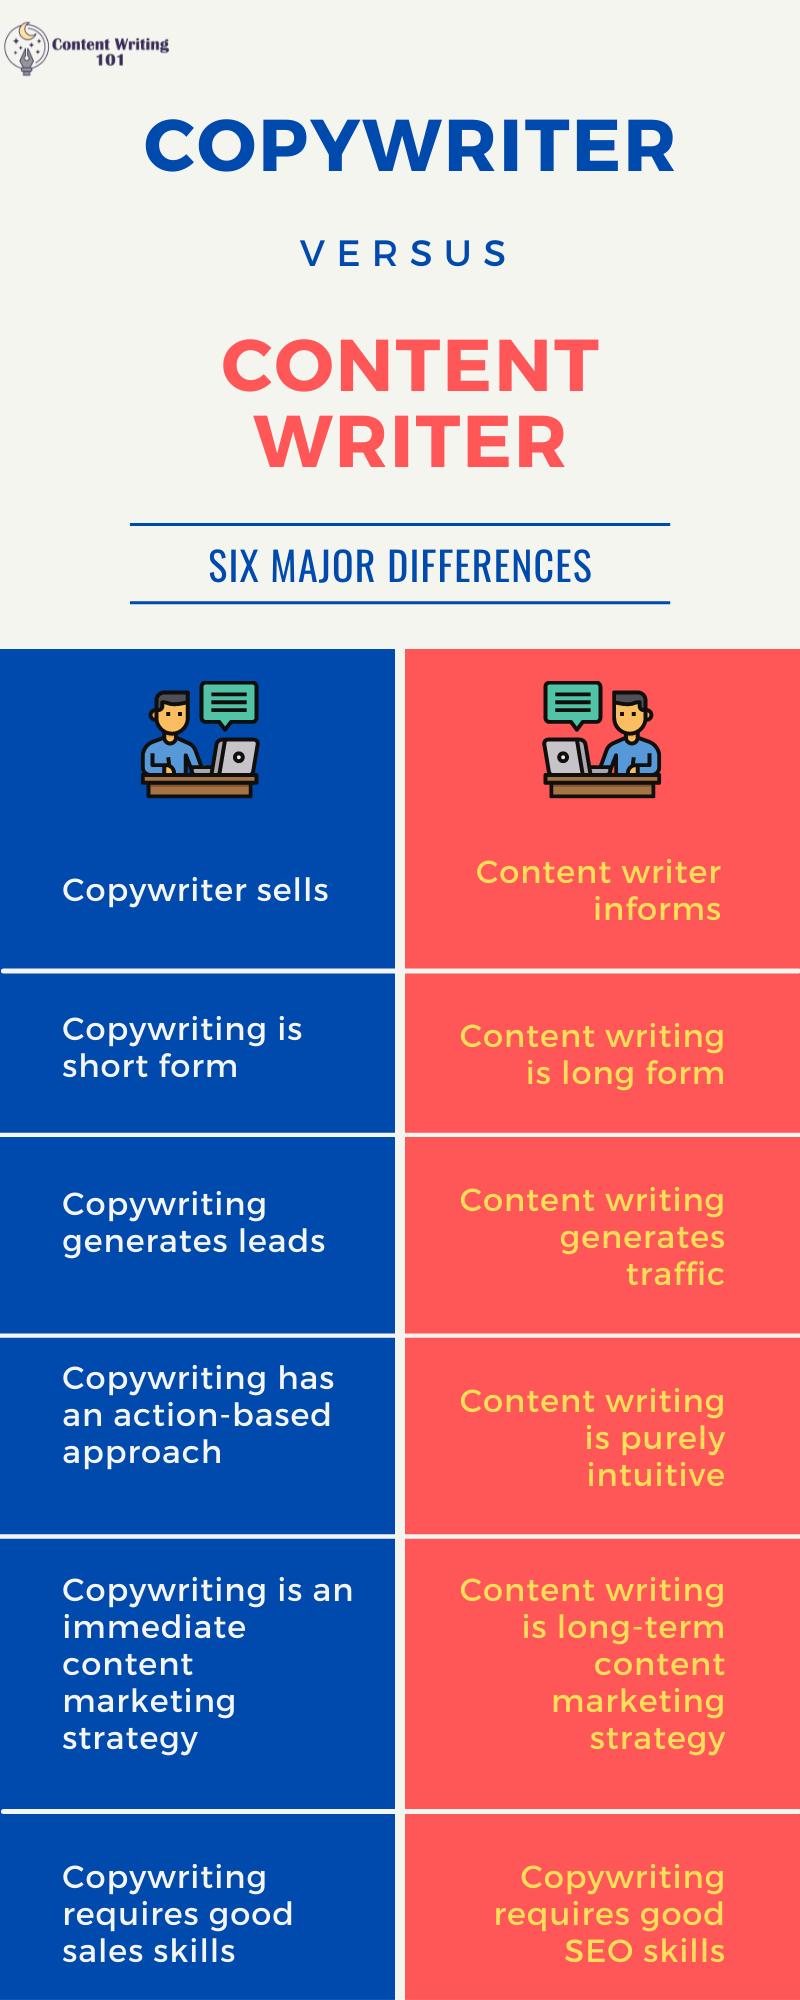 Copywriting Vs. Content Writing infographic